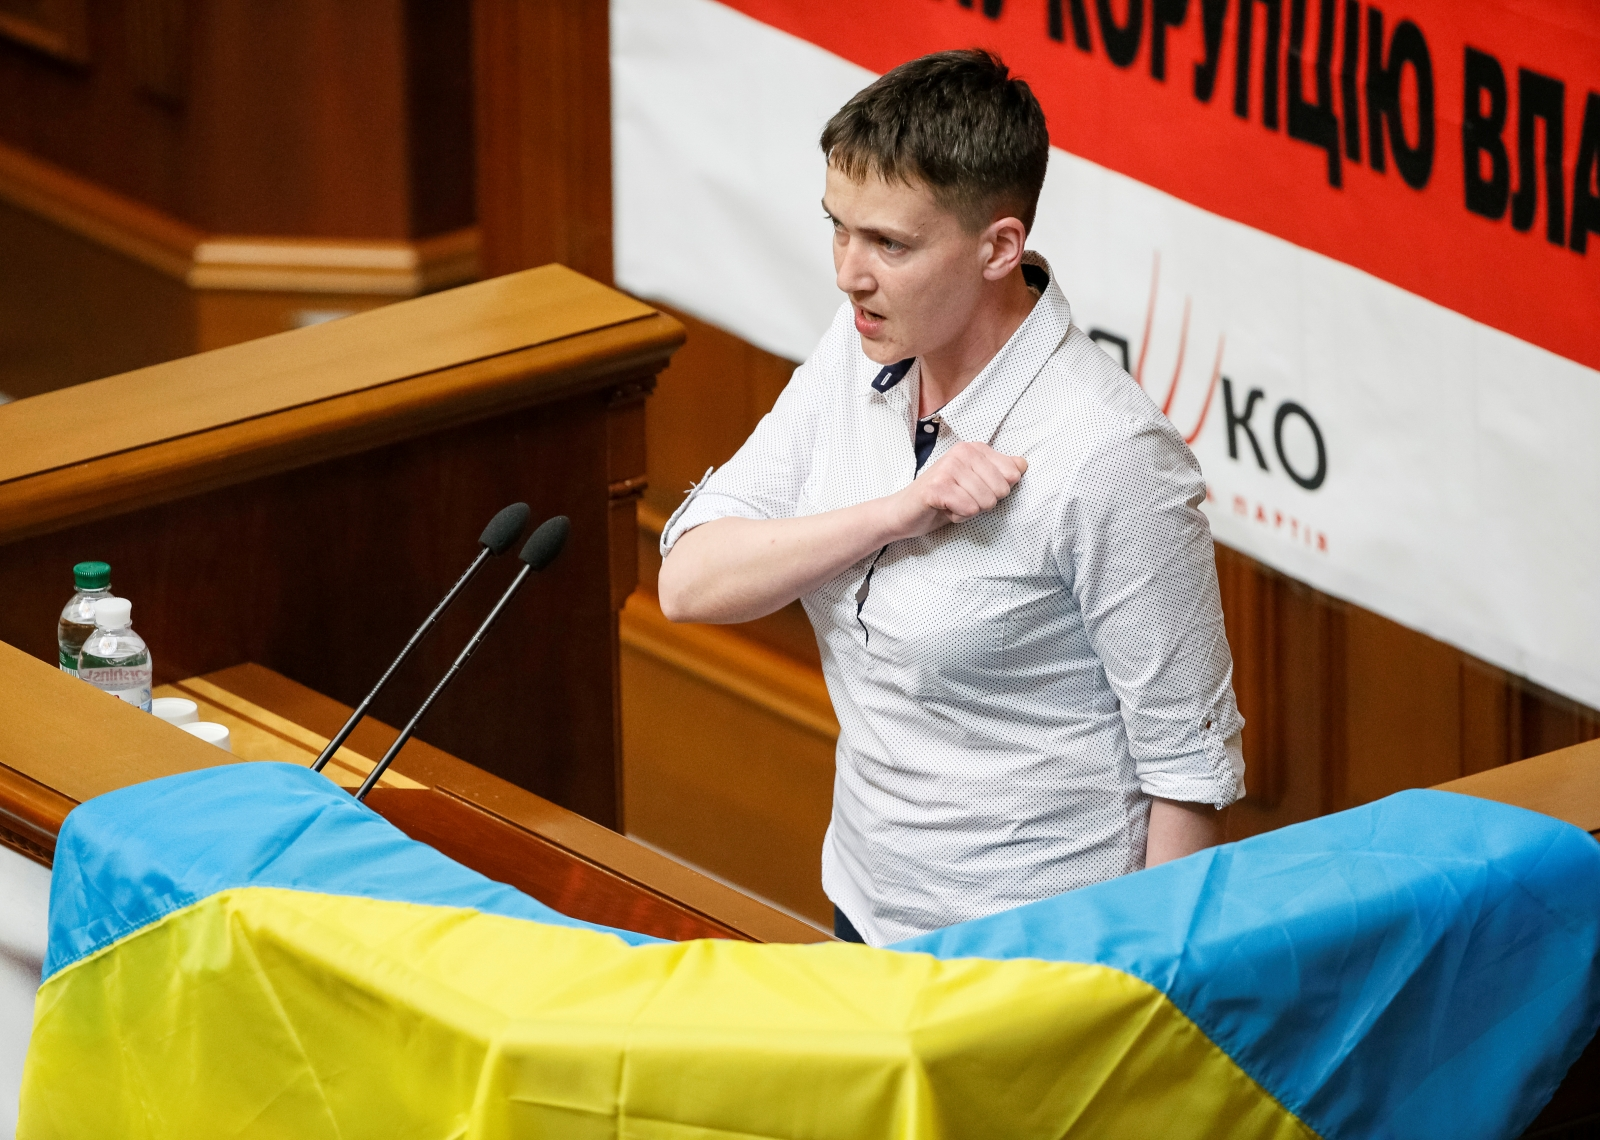 Nadia Shavchenko